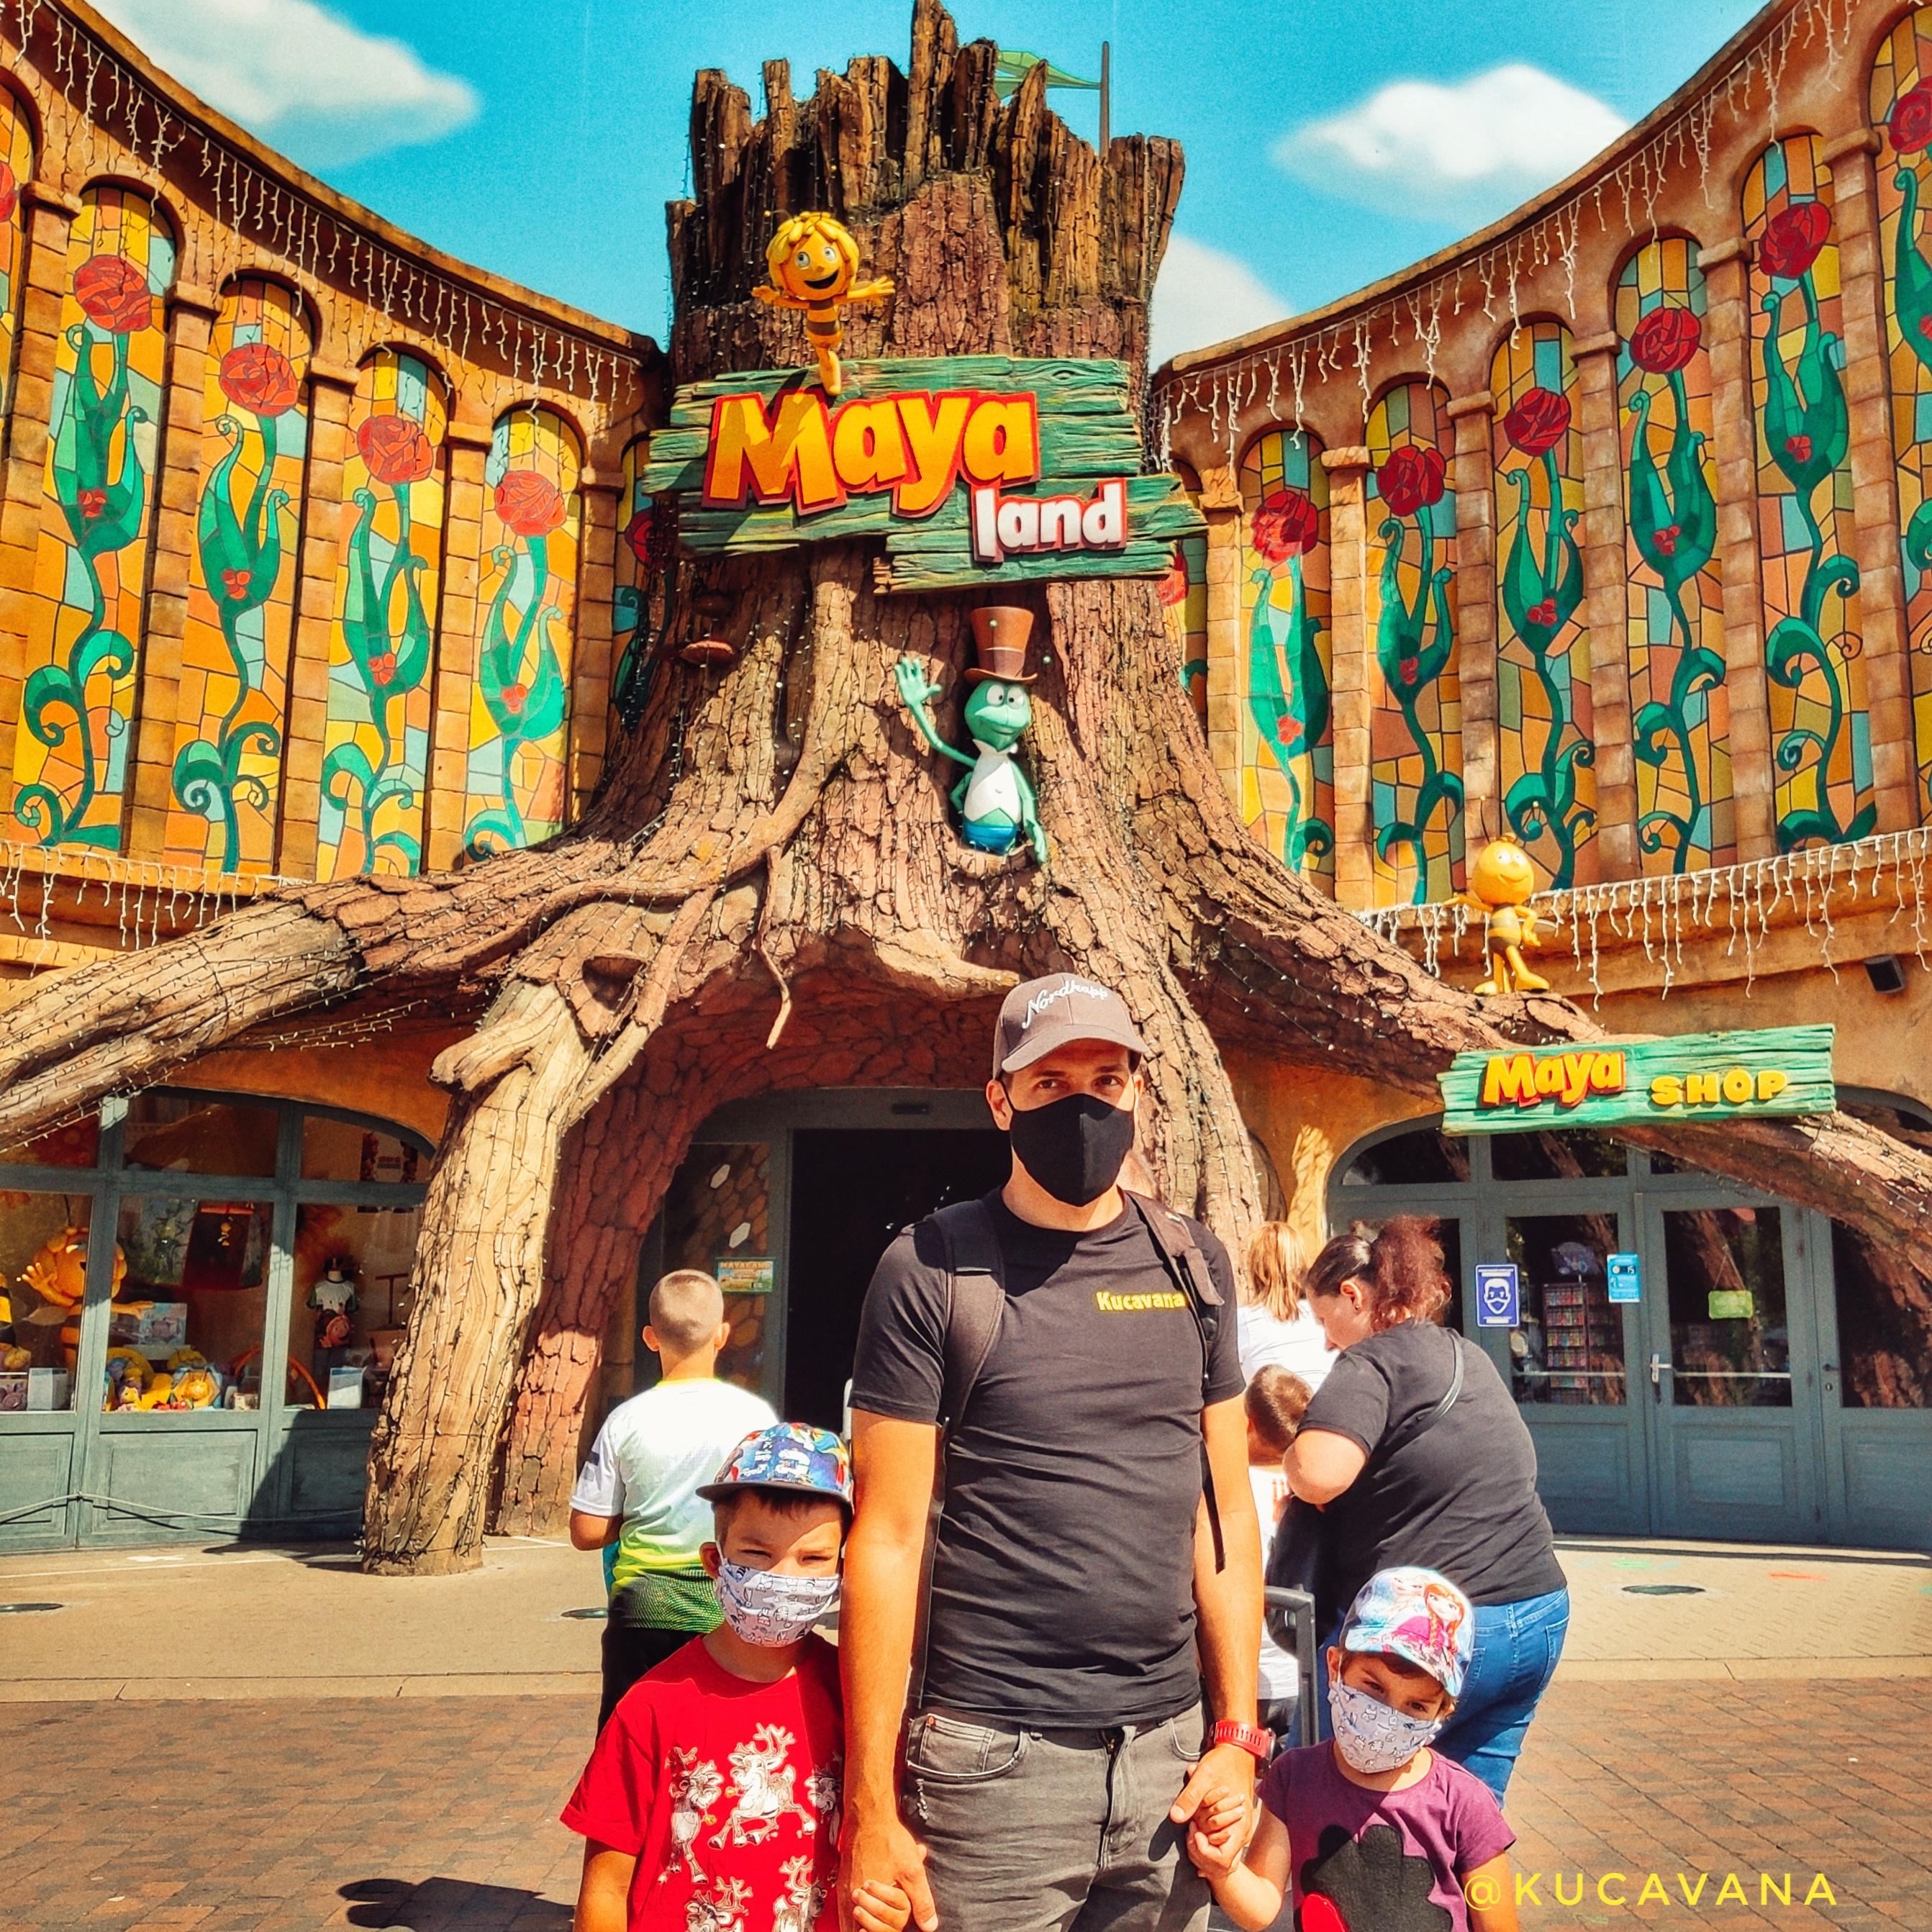 maya bee et willy avec leur parc d'attractions